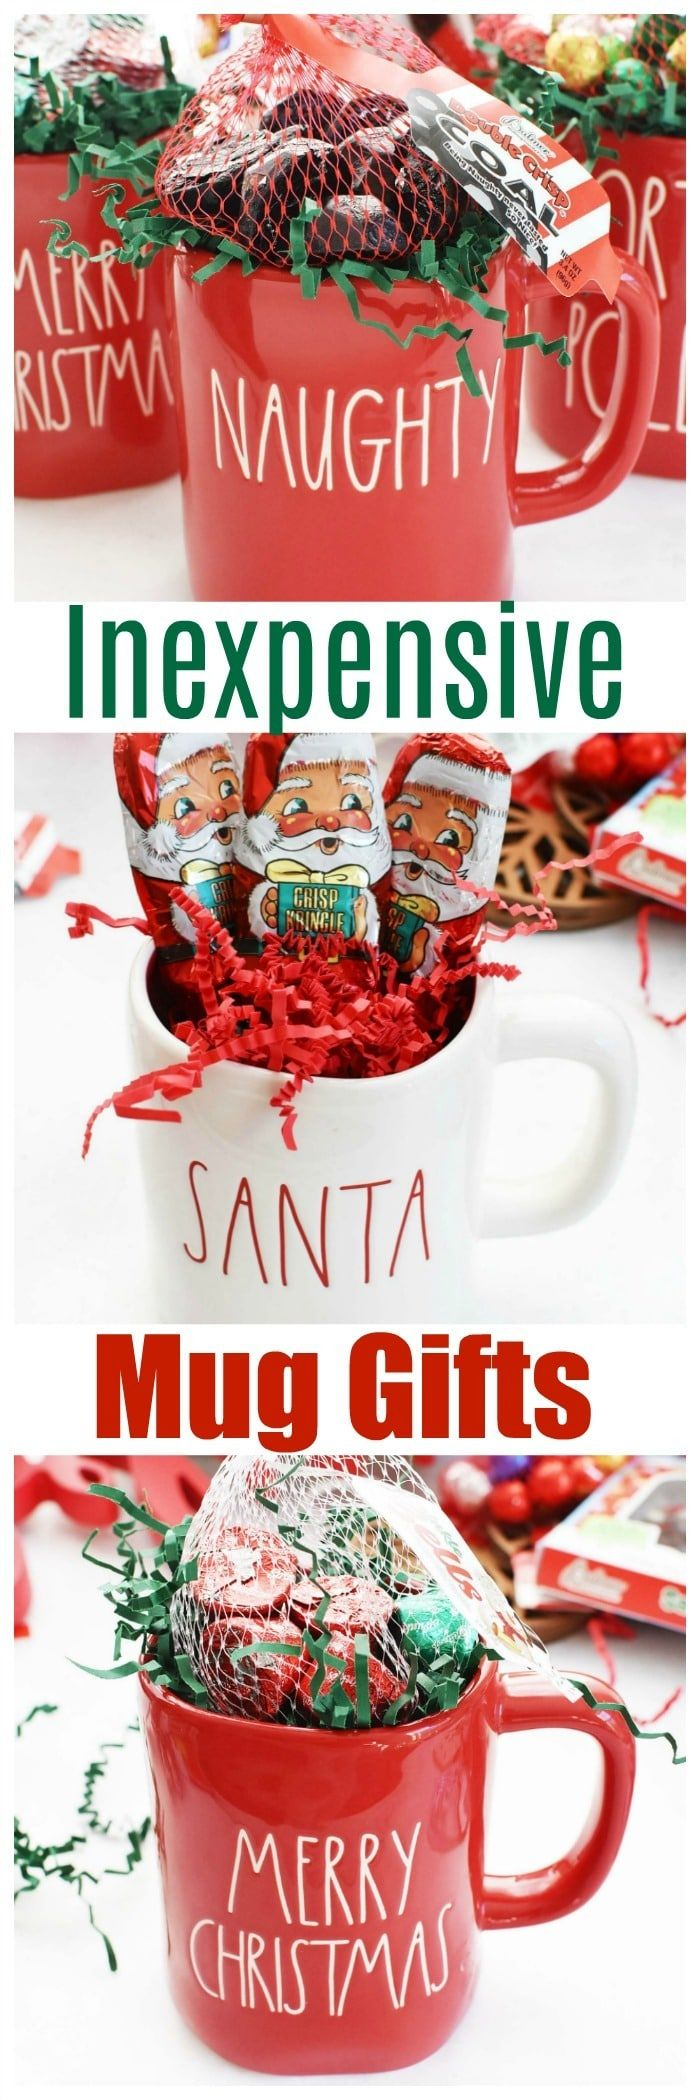 Inexpensive Mug Gift Ideas #coolmugs